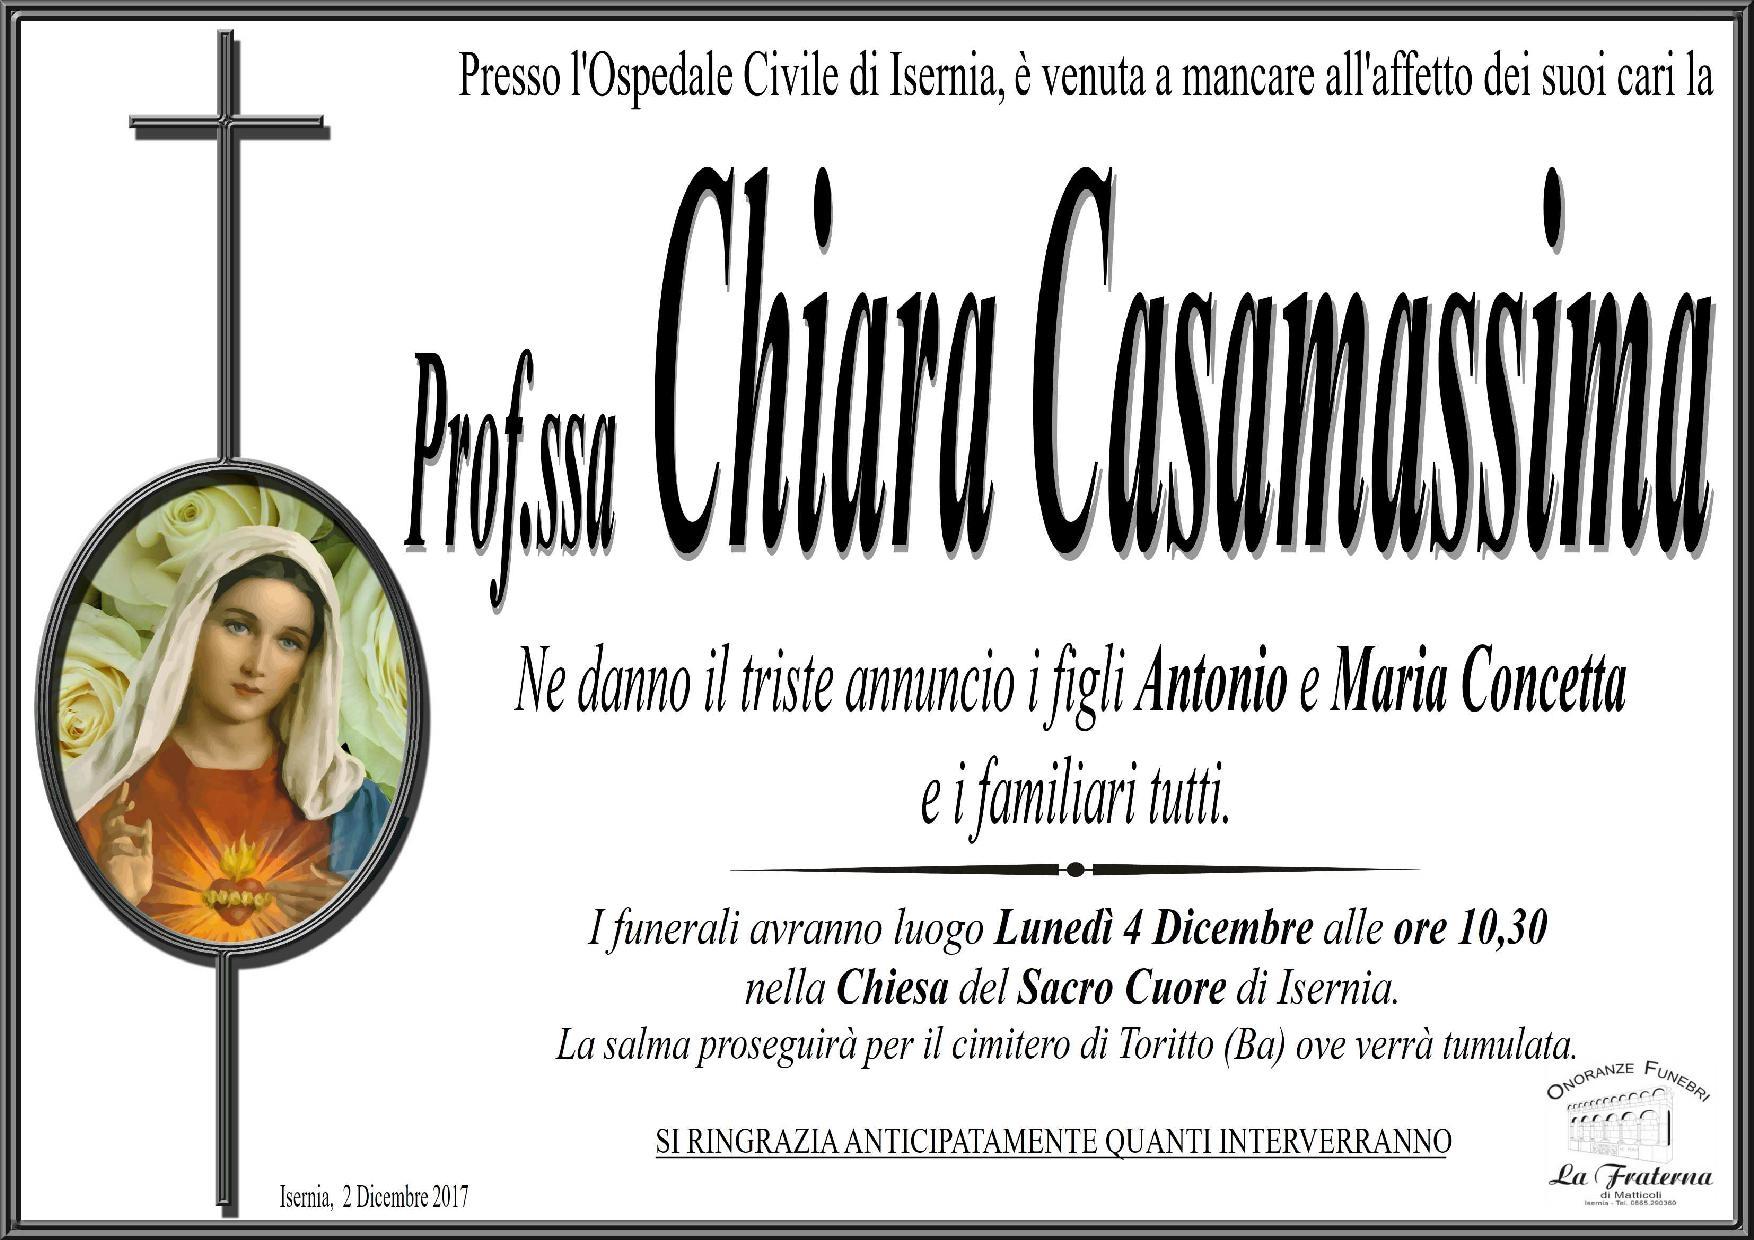 Chiara Casamassima – 2/12/2017 – Isernia – Onoranze Funebri La Fraterna